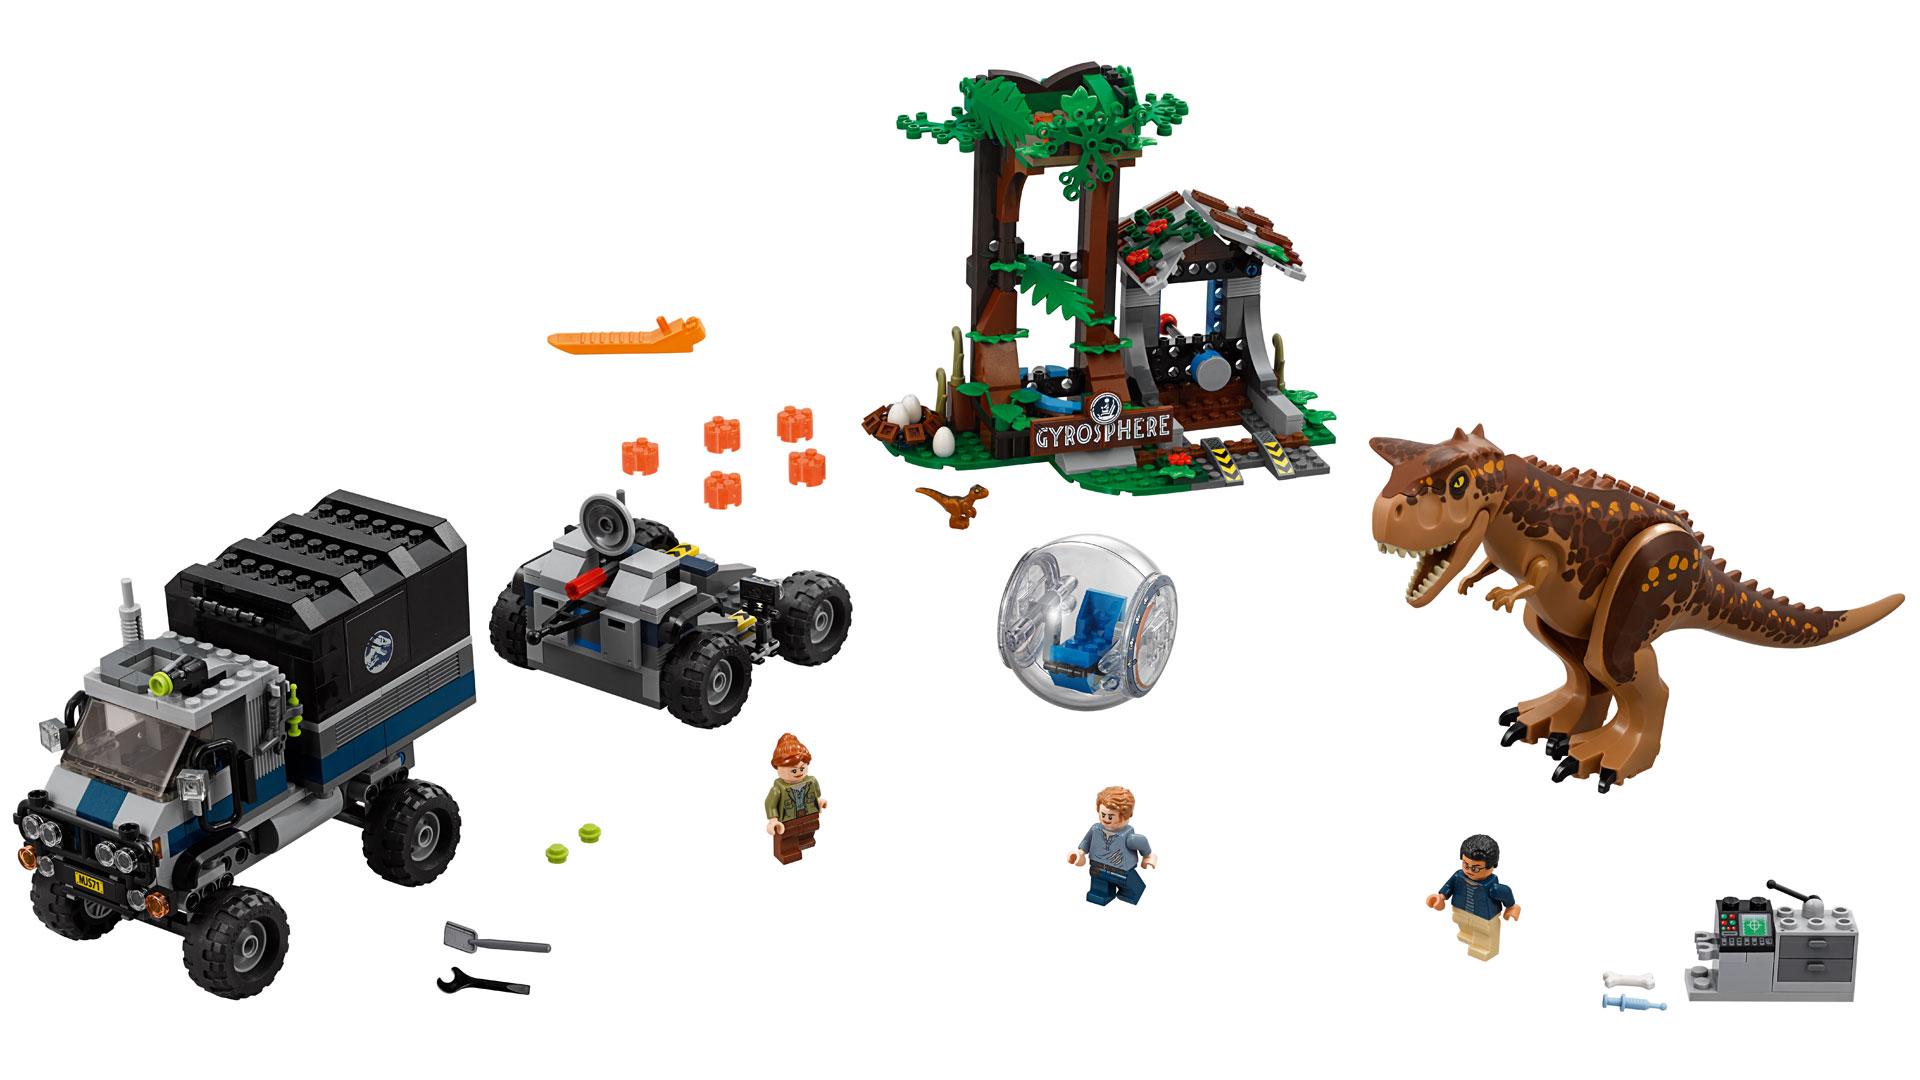 LEGO Jurassic World Set 75927 Carnotaurus Gyrosphere Escape at Toy Fair 2018